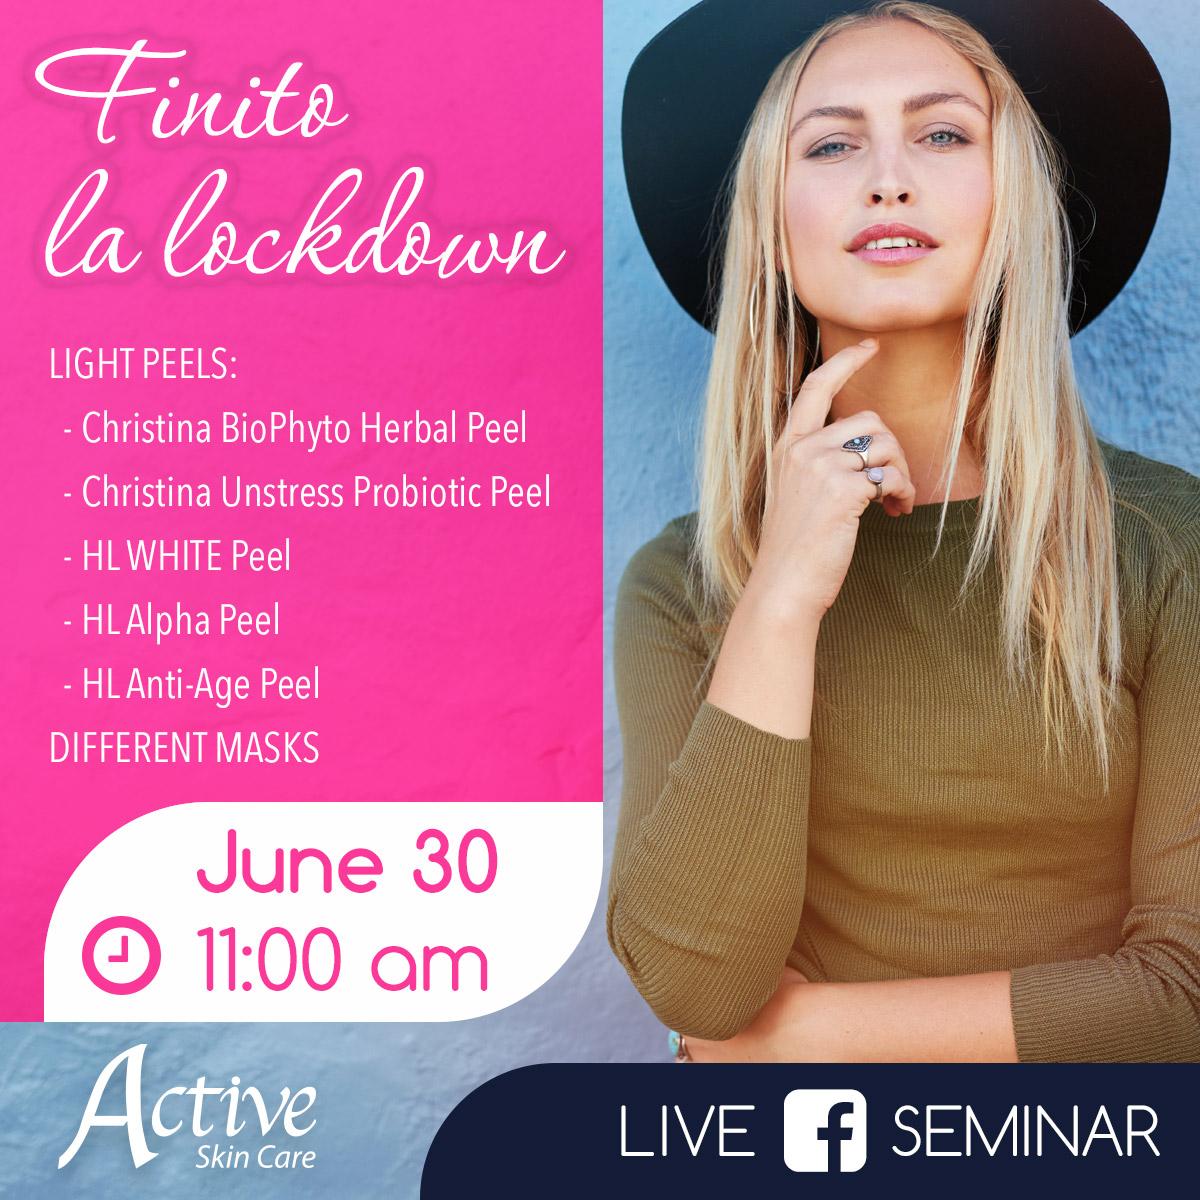 Upcoming Facebook Live Beauty Seminar on Tuesday, June 30th at 11:00 am